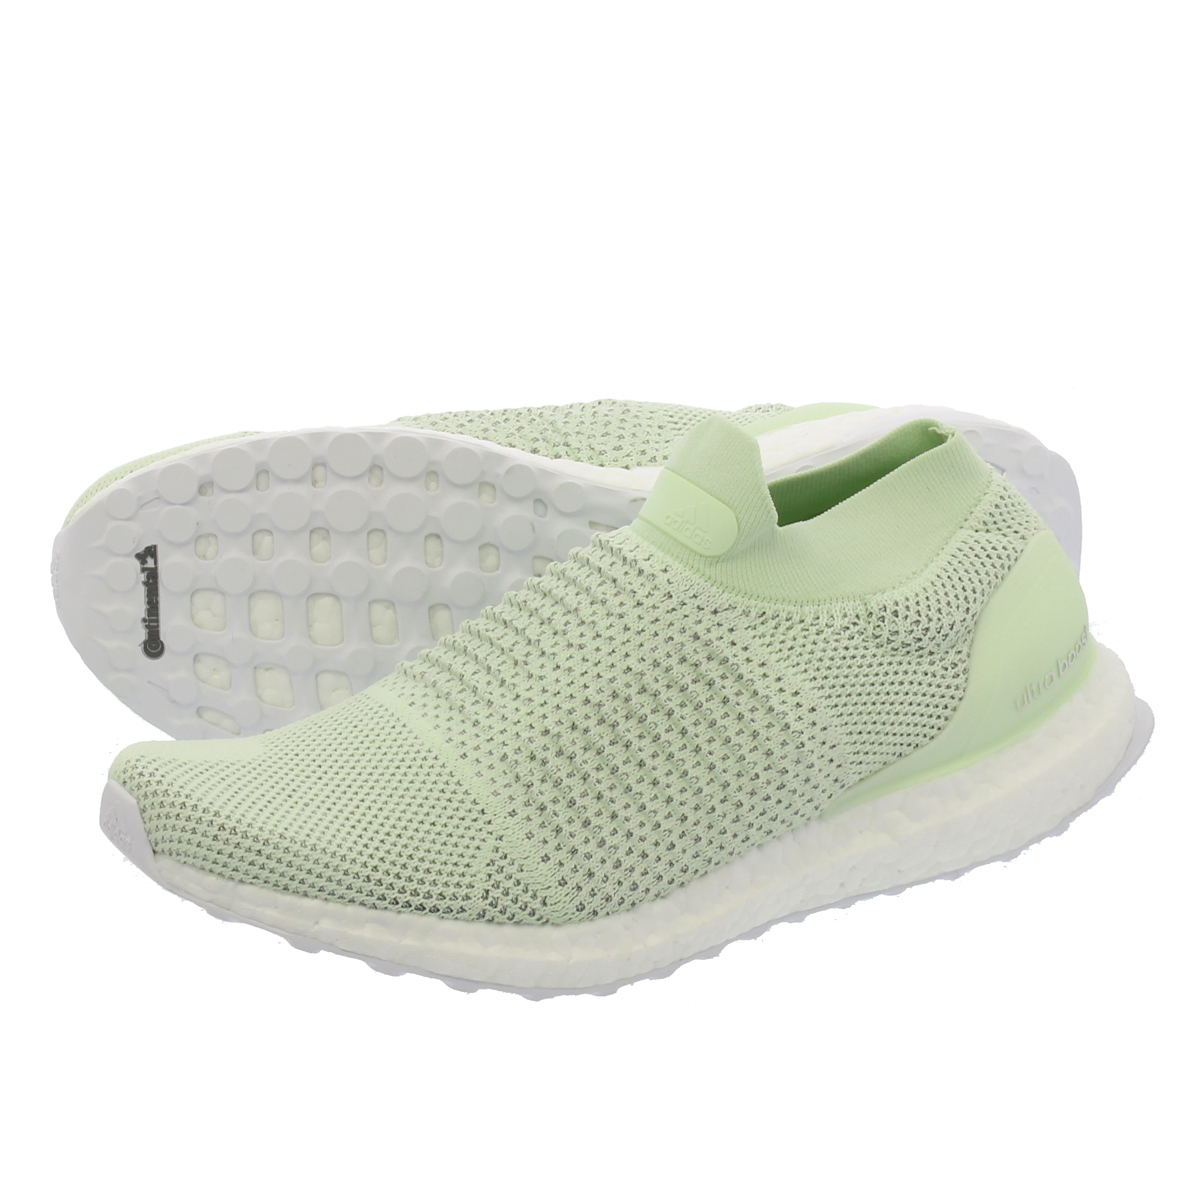 34b422f3e6f2 LOWTEX PLUS  adidas UltraBOOST LACELESS LTD Adidas ultra boost raceless LTD  ASH GREEN AERO GREEN RUNNING WHITE